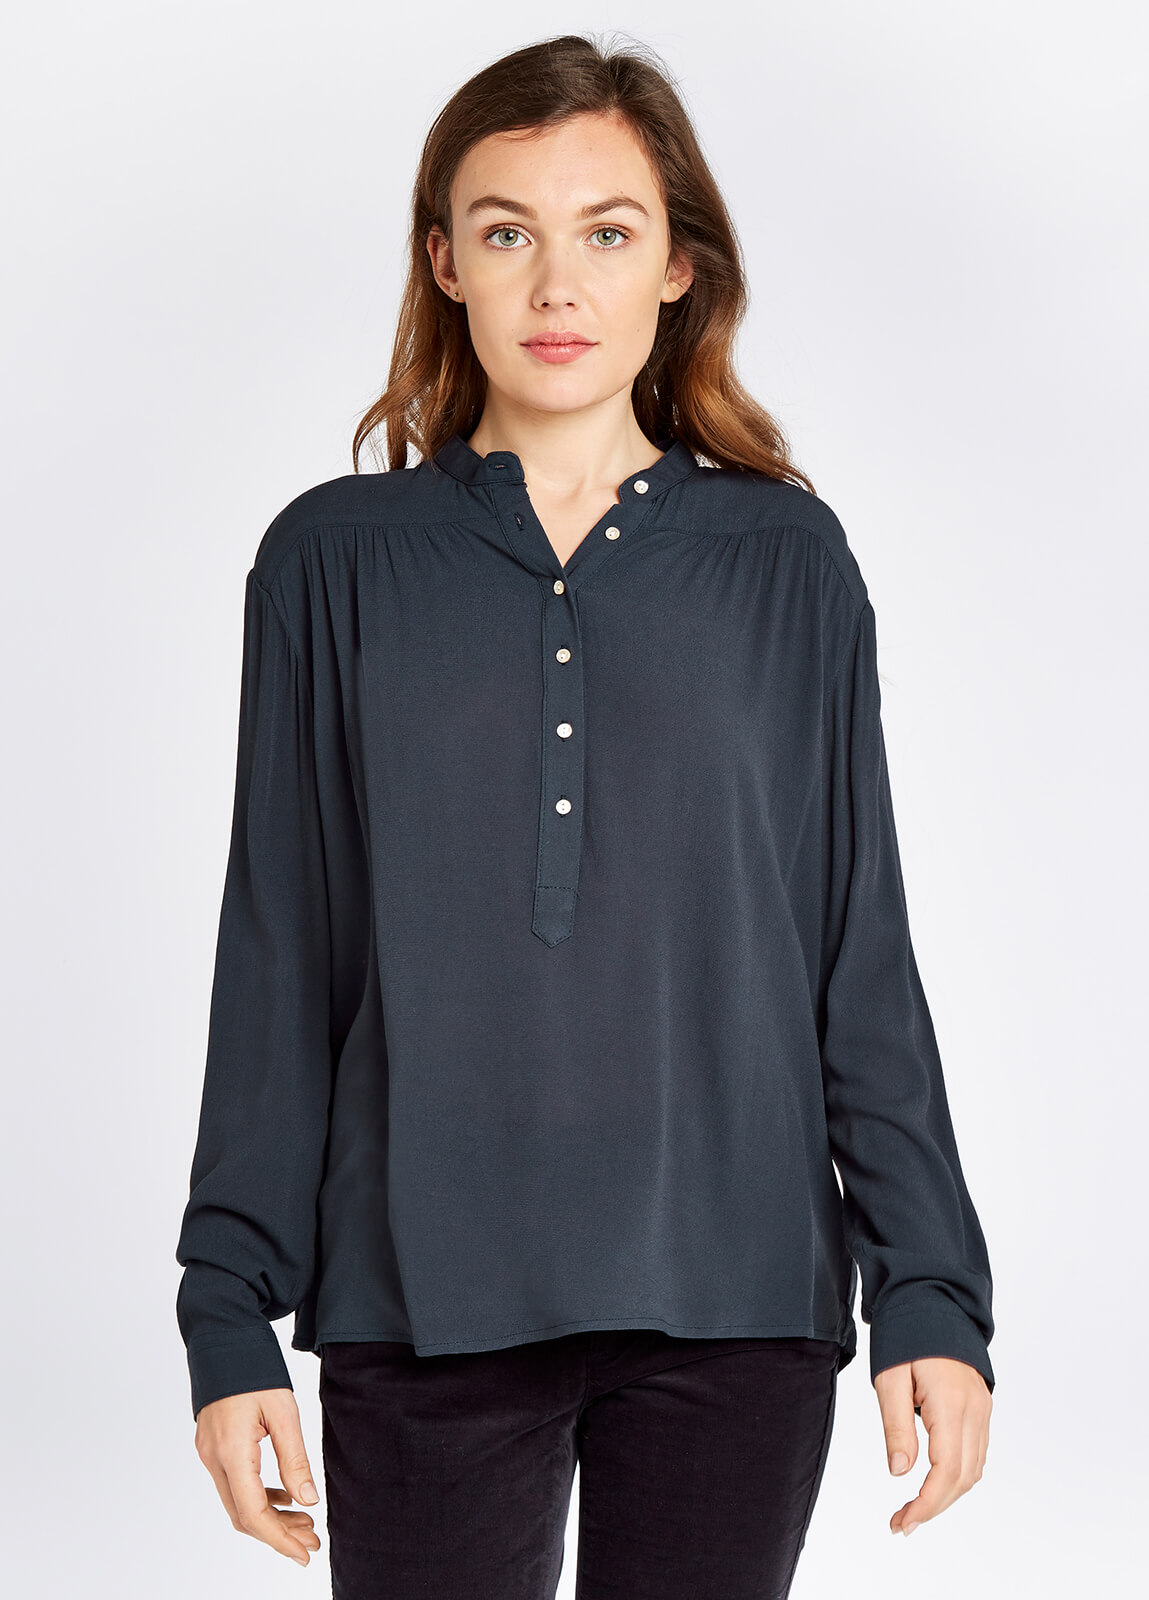 Arbor Shirt - Navy